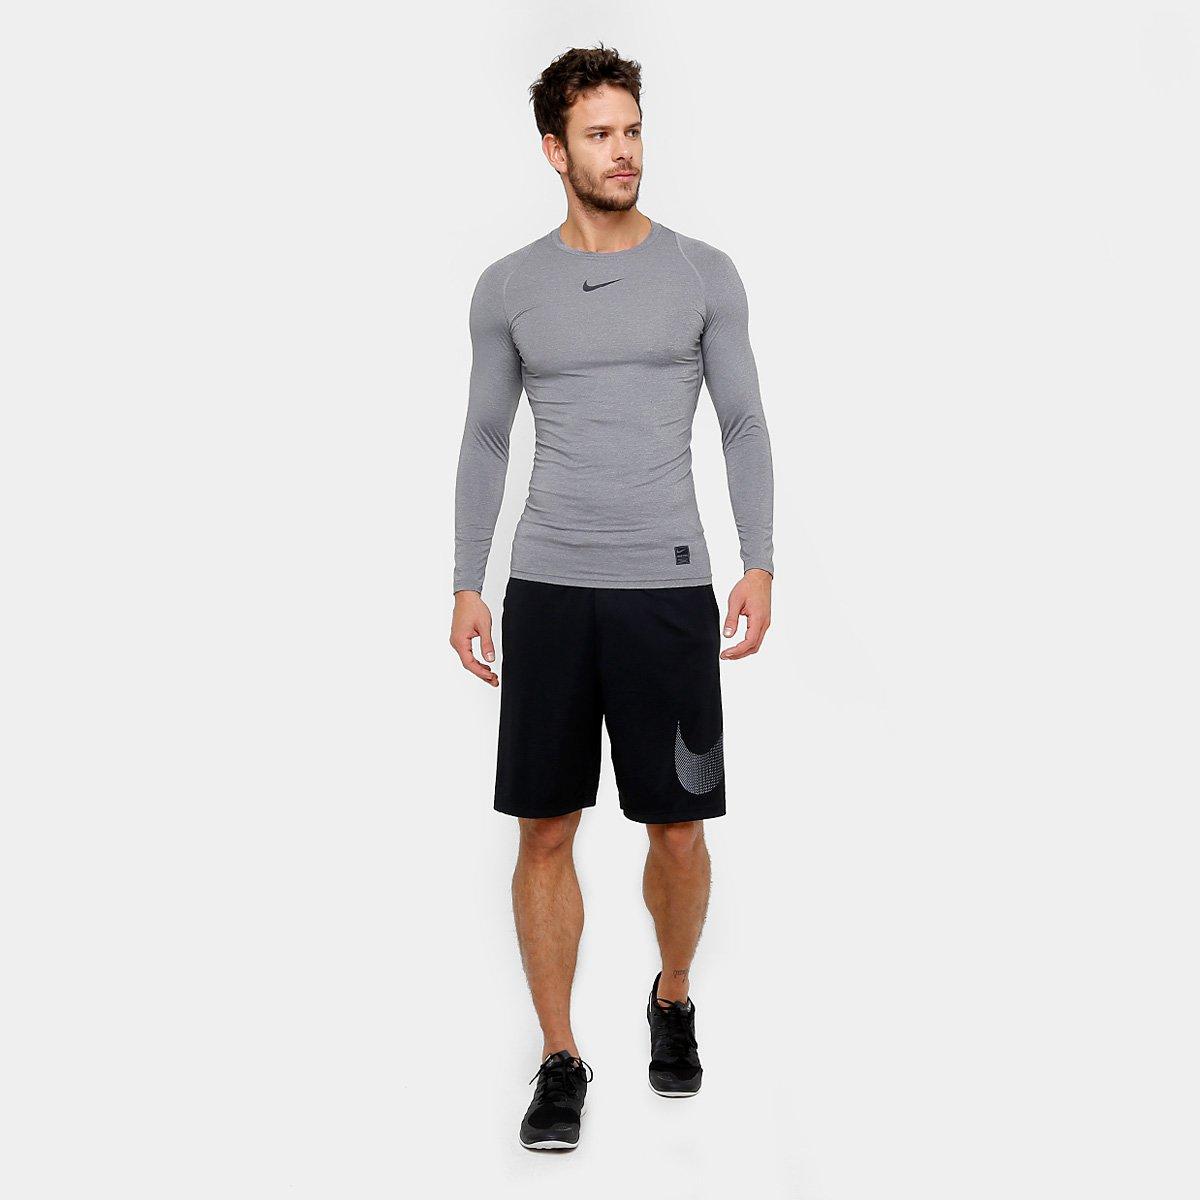 ... Camiseta Compressão Nike Pro Manga Longa Masculina - Cinza e Preto . ab0626ae6d191